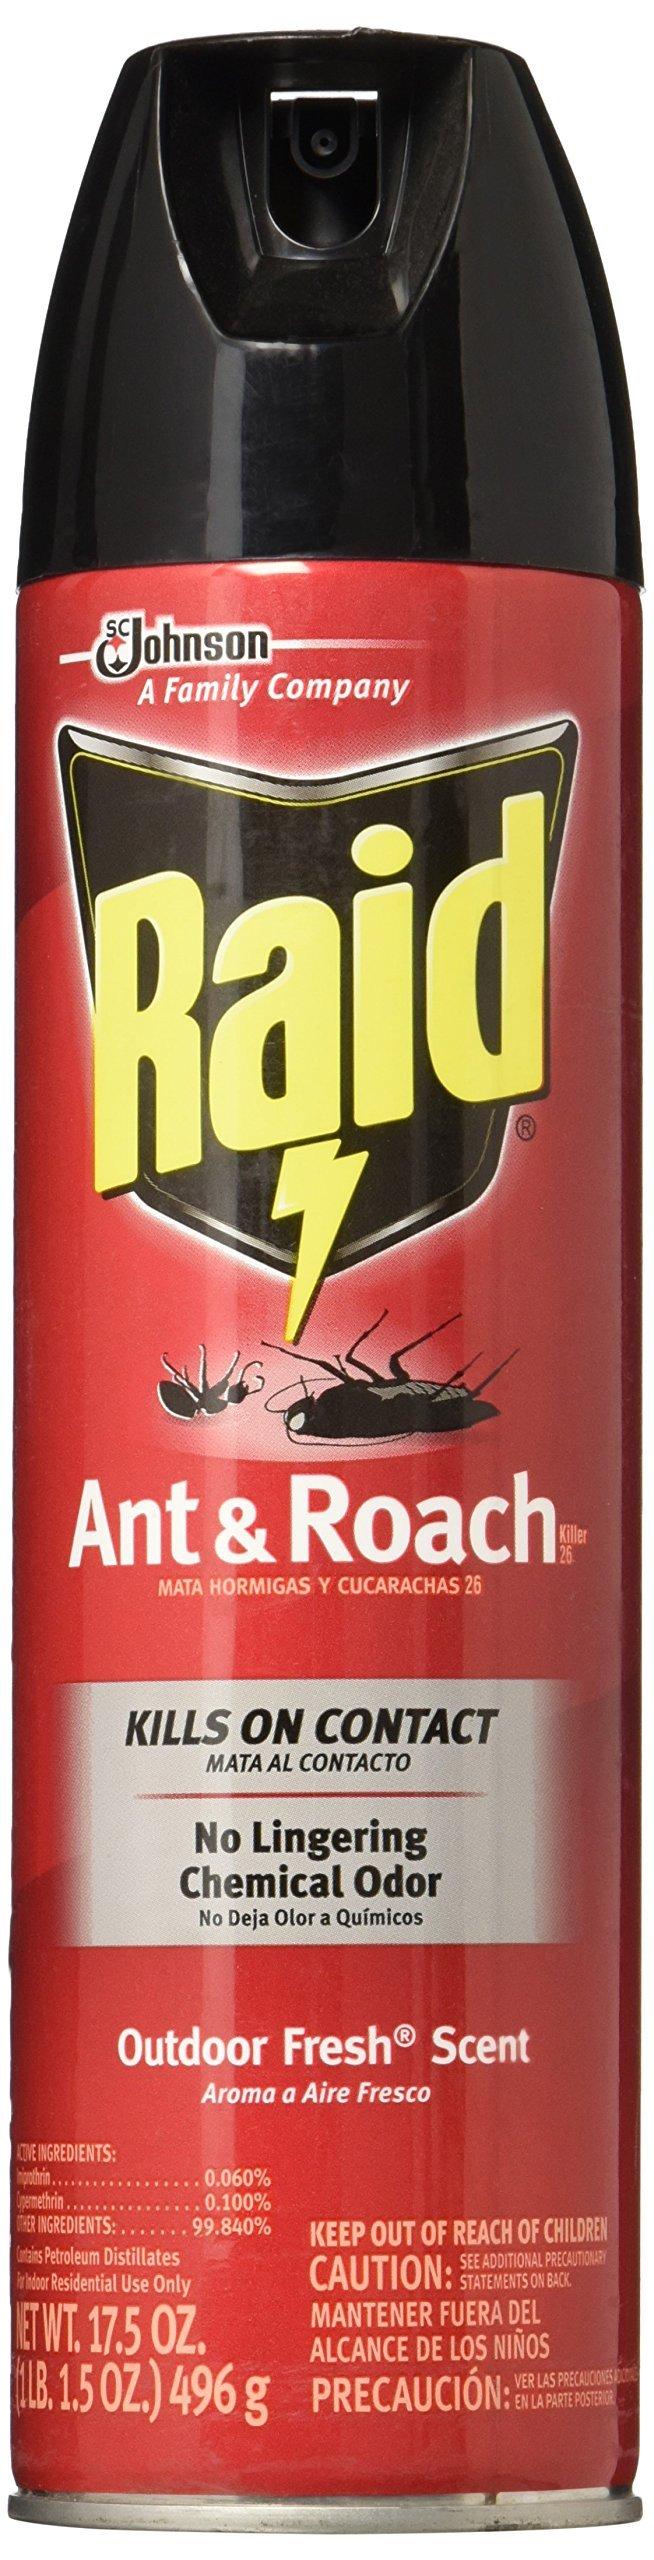 Raid Ant & Roach Killer Insecticide Spray-Outdoor Fresh - 17.5 oz